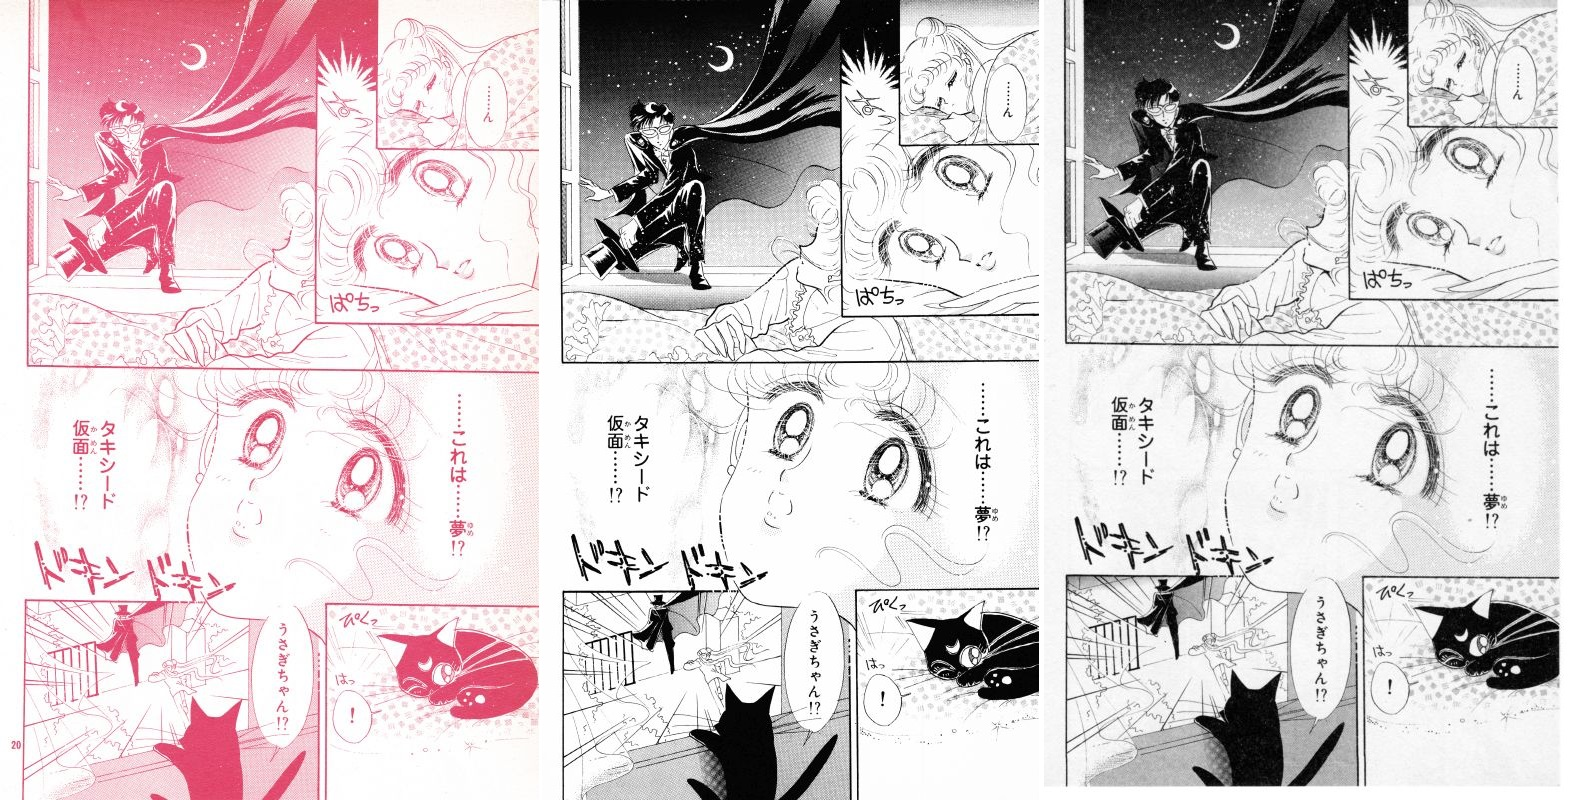 Act 5, Page 18 – Nakayoshi, Original, Remaster